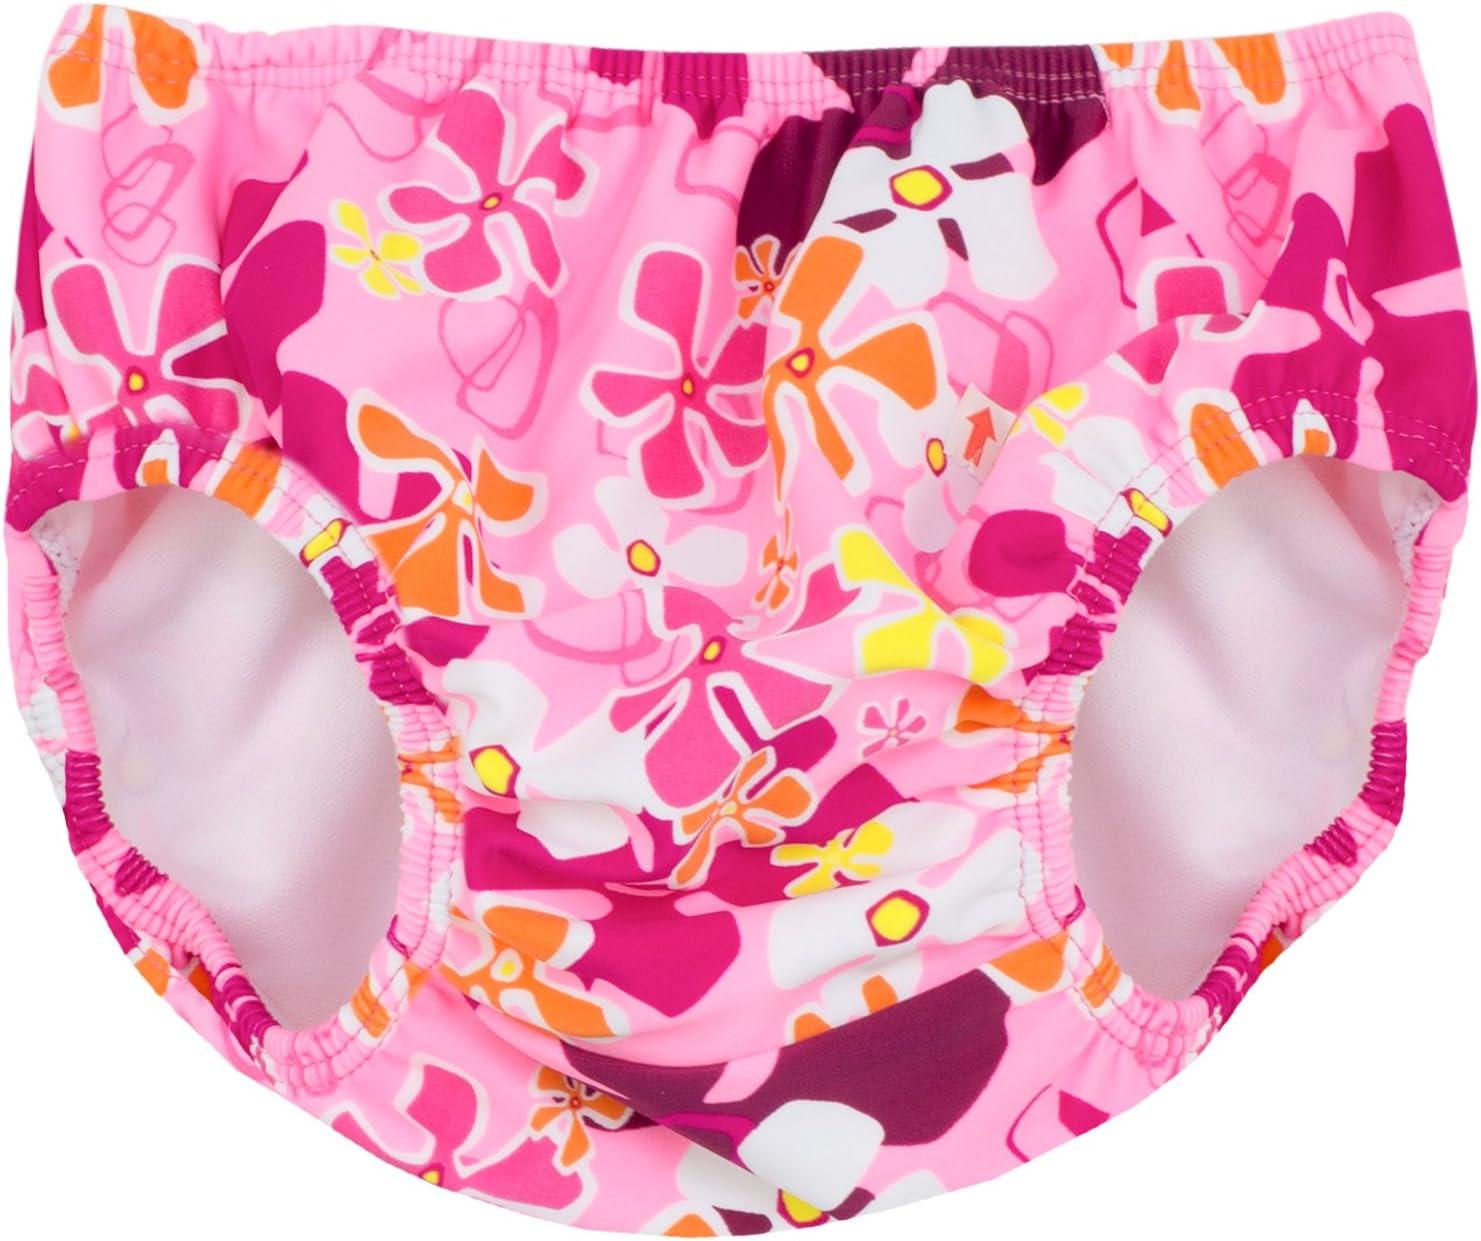 Tuga Girls Genuine Free Shipping Reusable Swim Diapers Swimsui UPF 50+ Sun Milwaukee Mall Protection